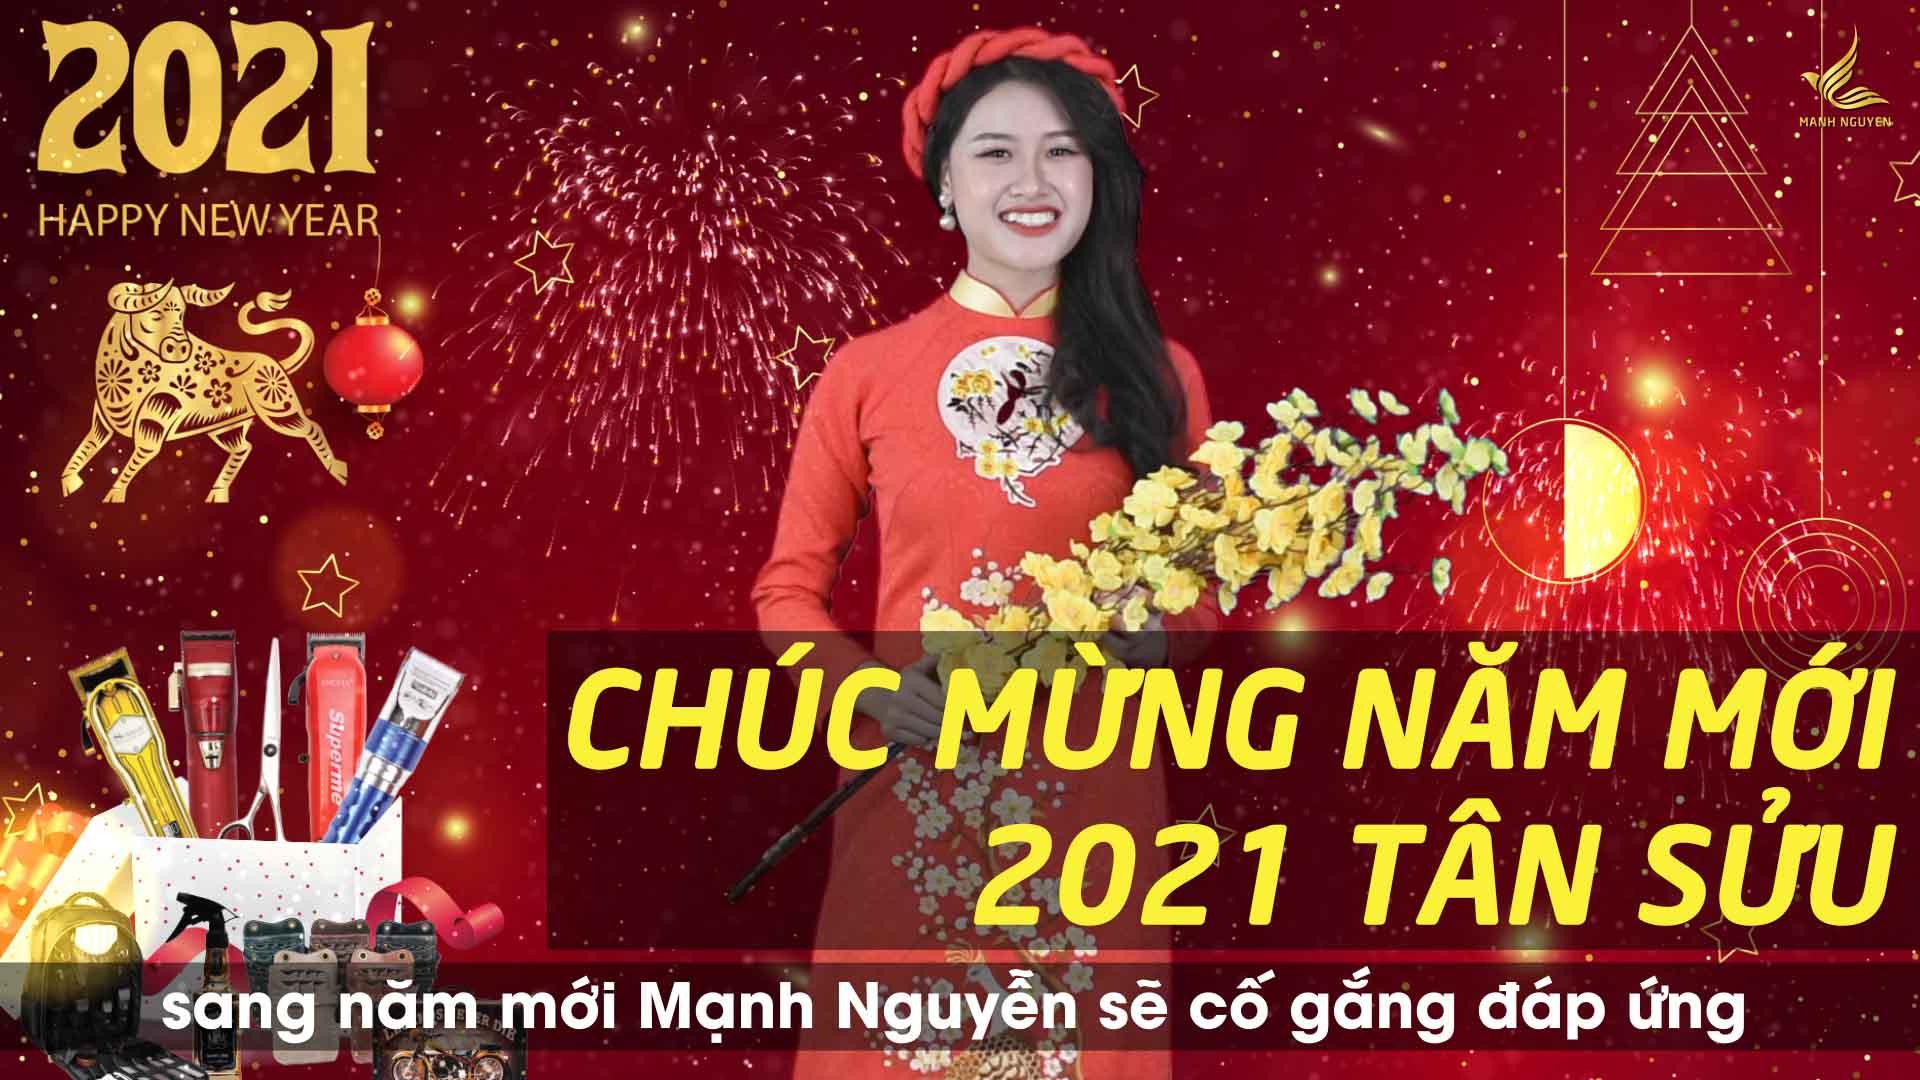 happy new year- chuc mung nam moi 2021 tan suu